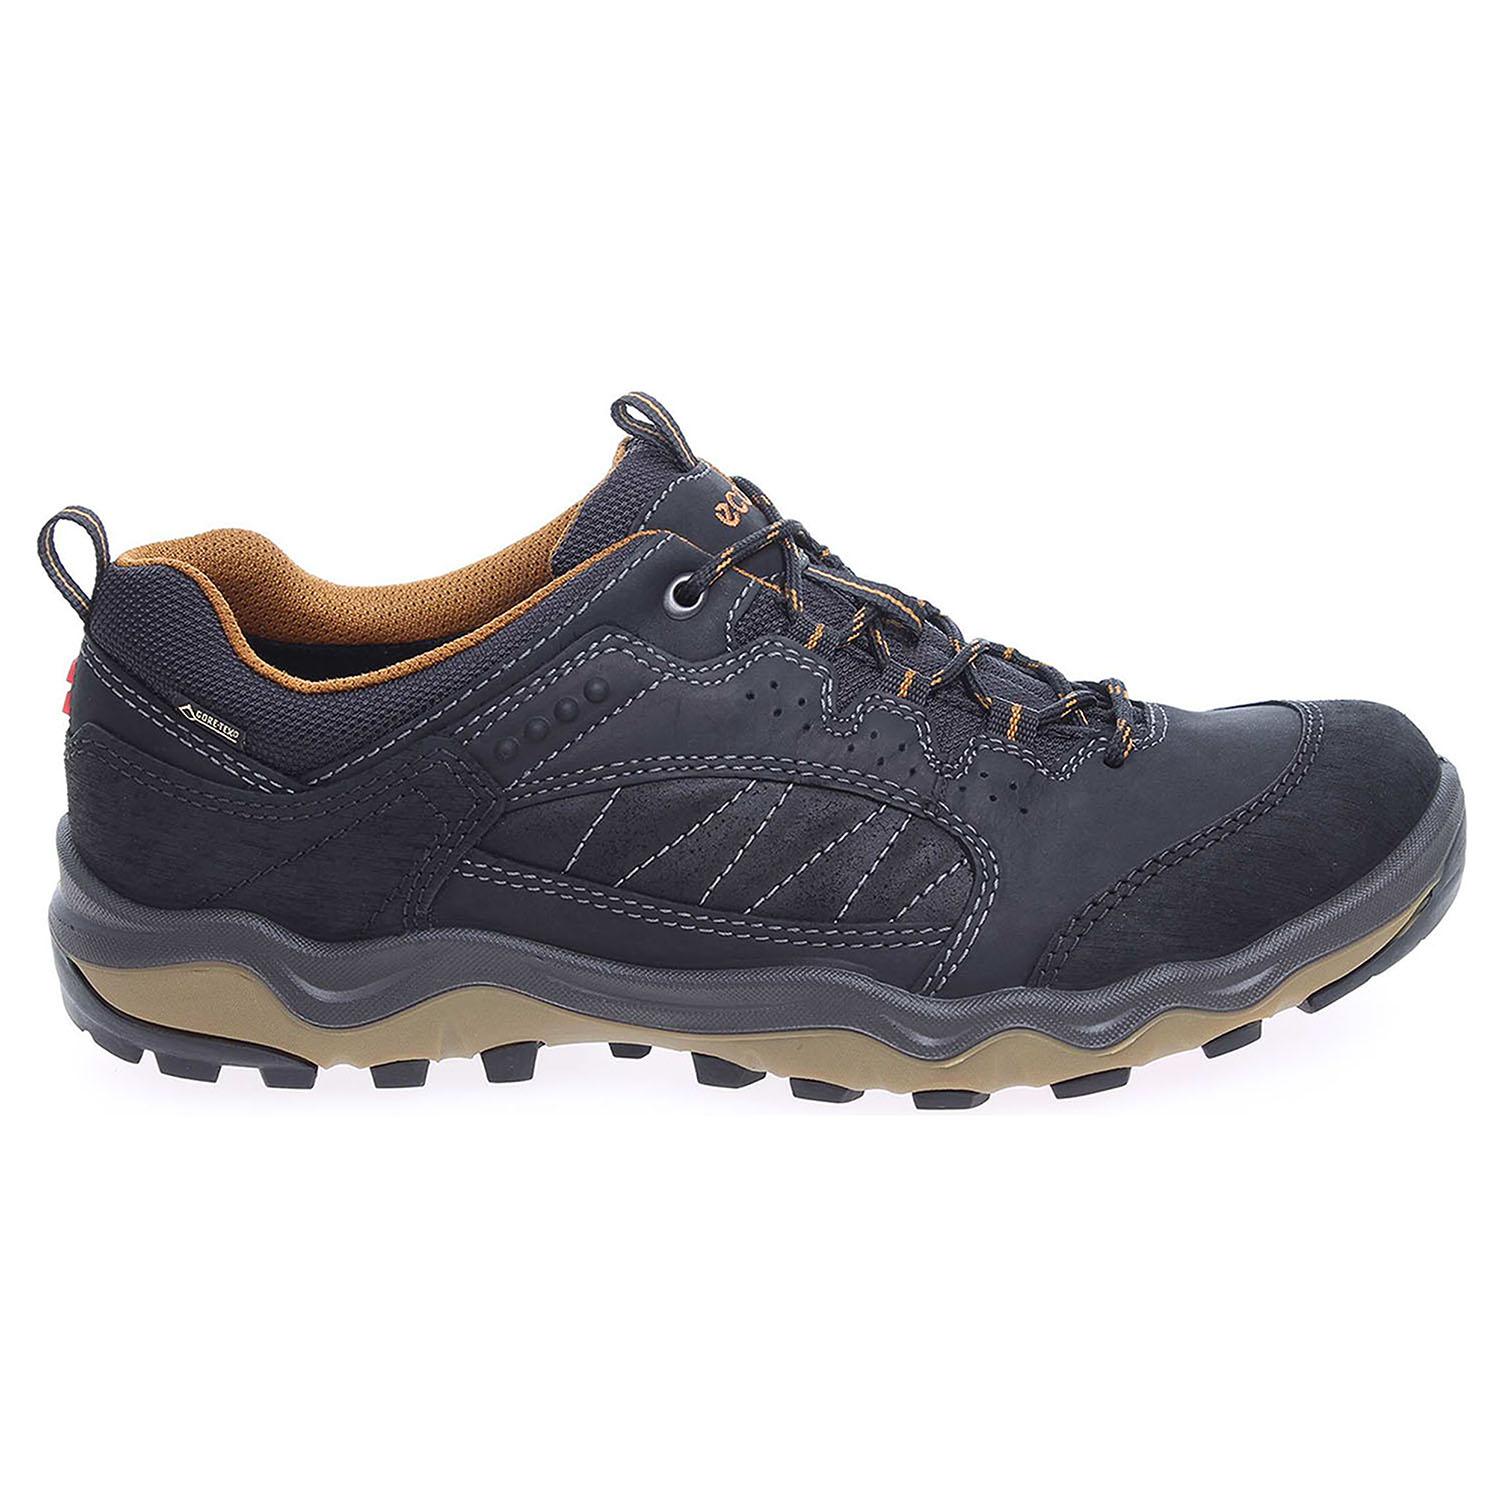 Ecco Ulterra pánská obuv 82312458654 černá  3ecbfc8e75c